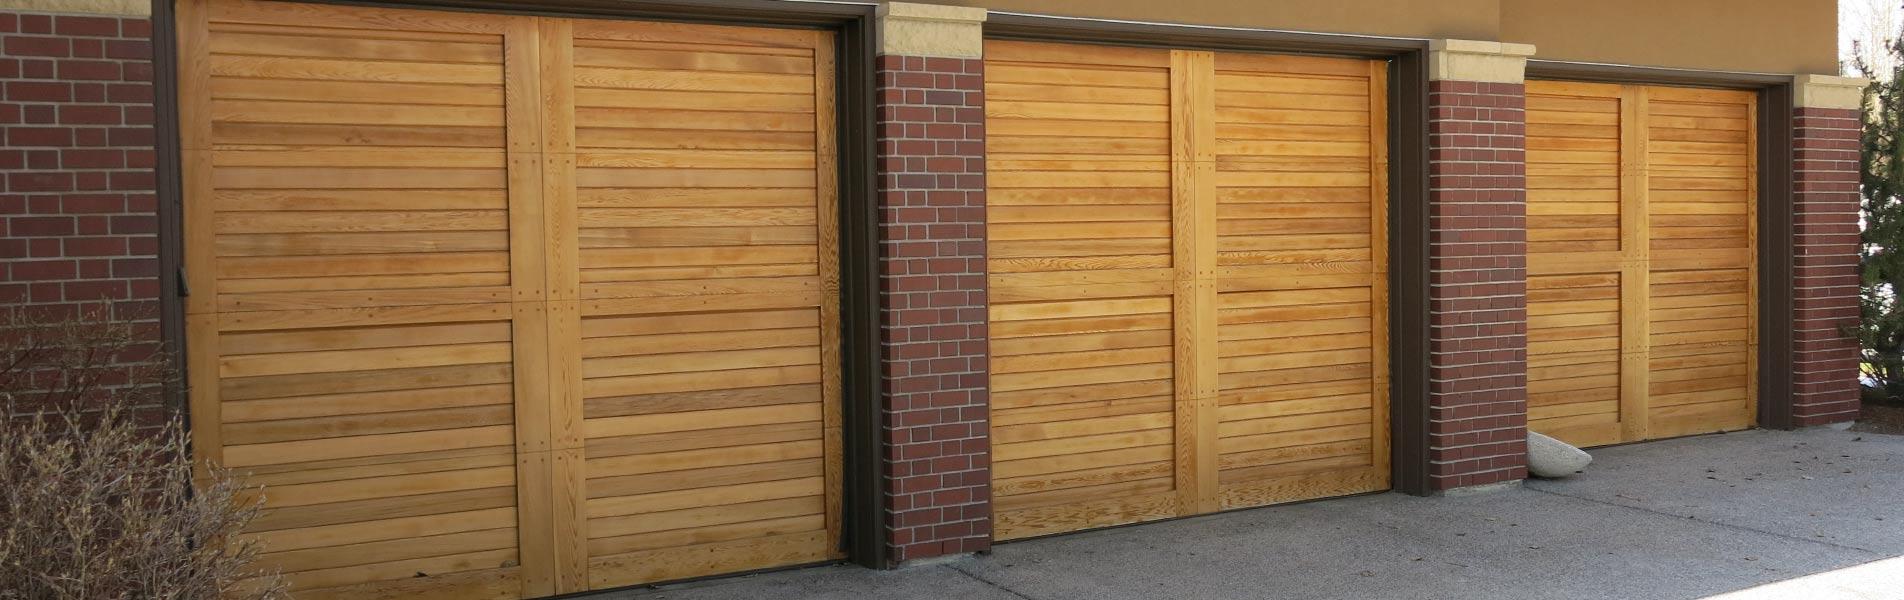 Equal Industries Carriage Style Custom Wood Doors